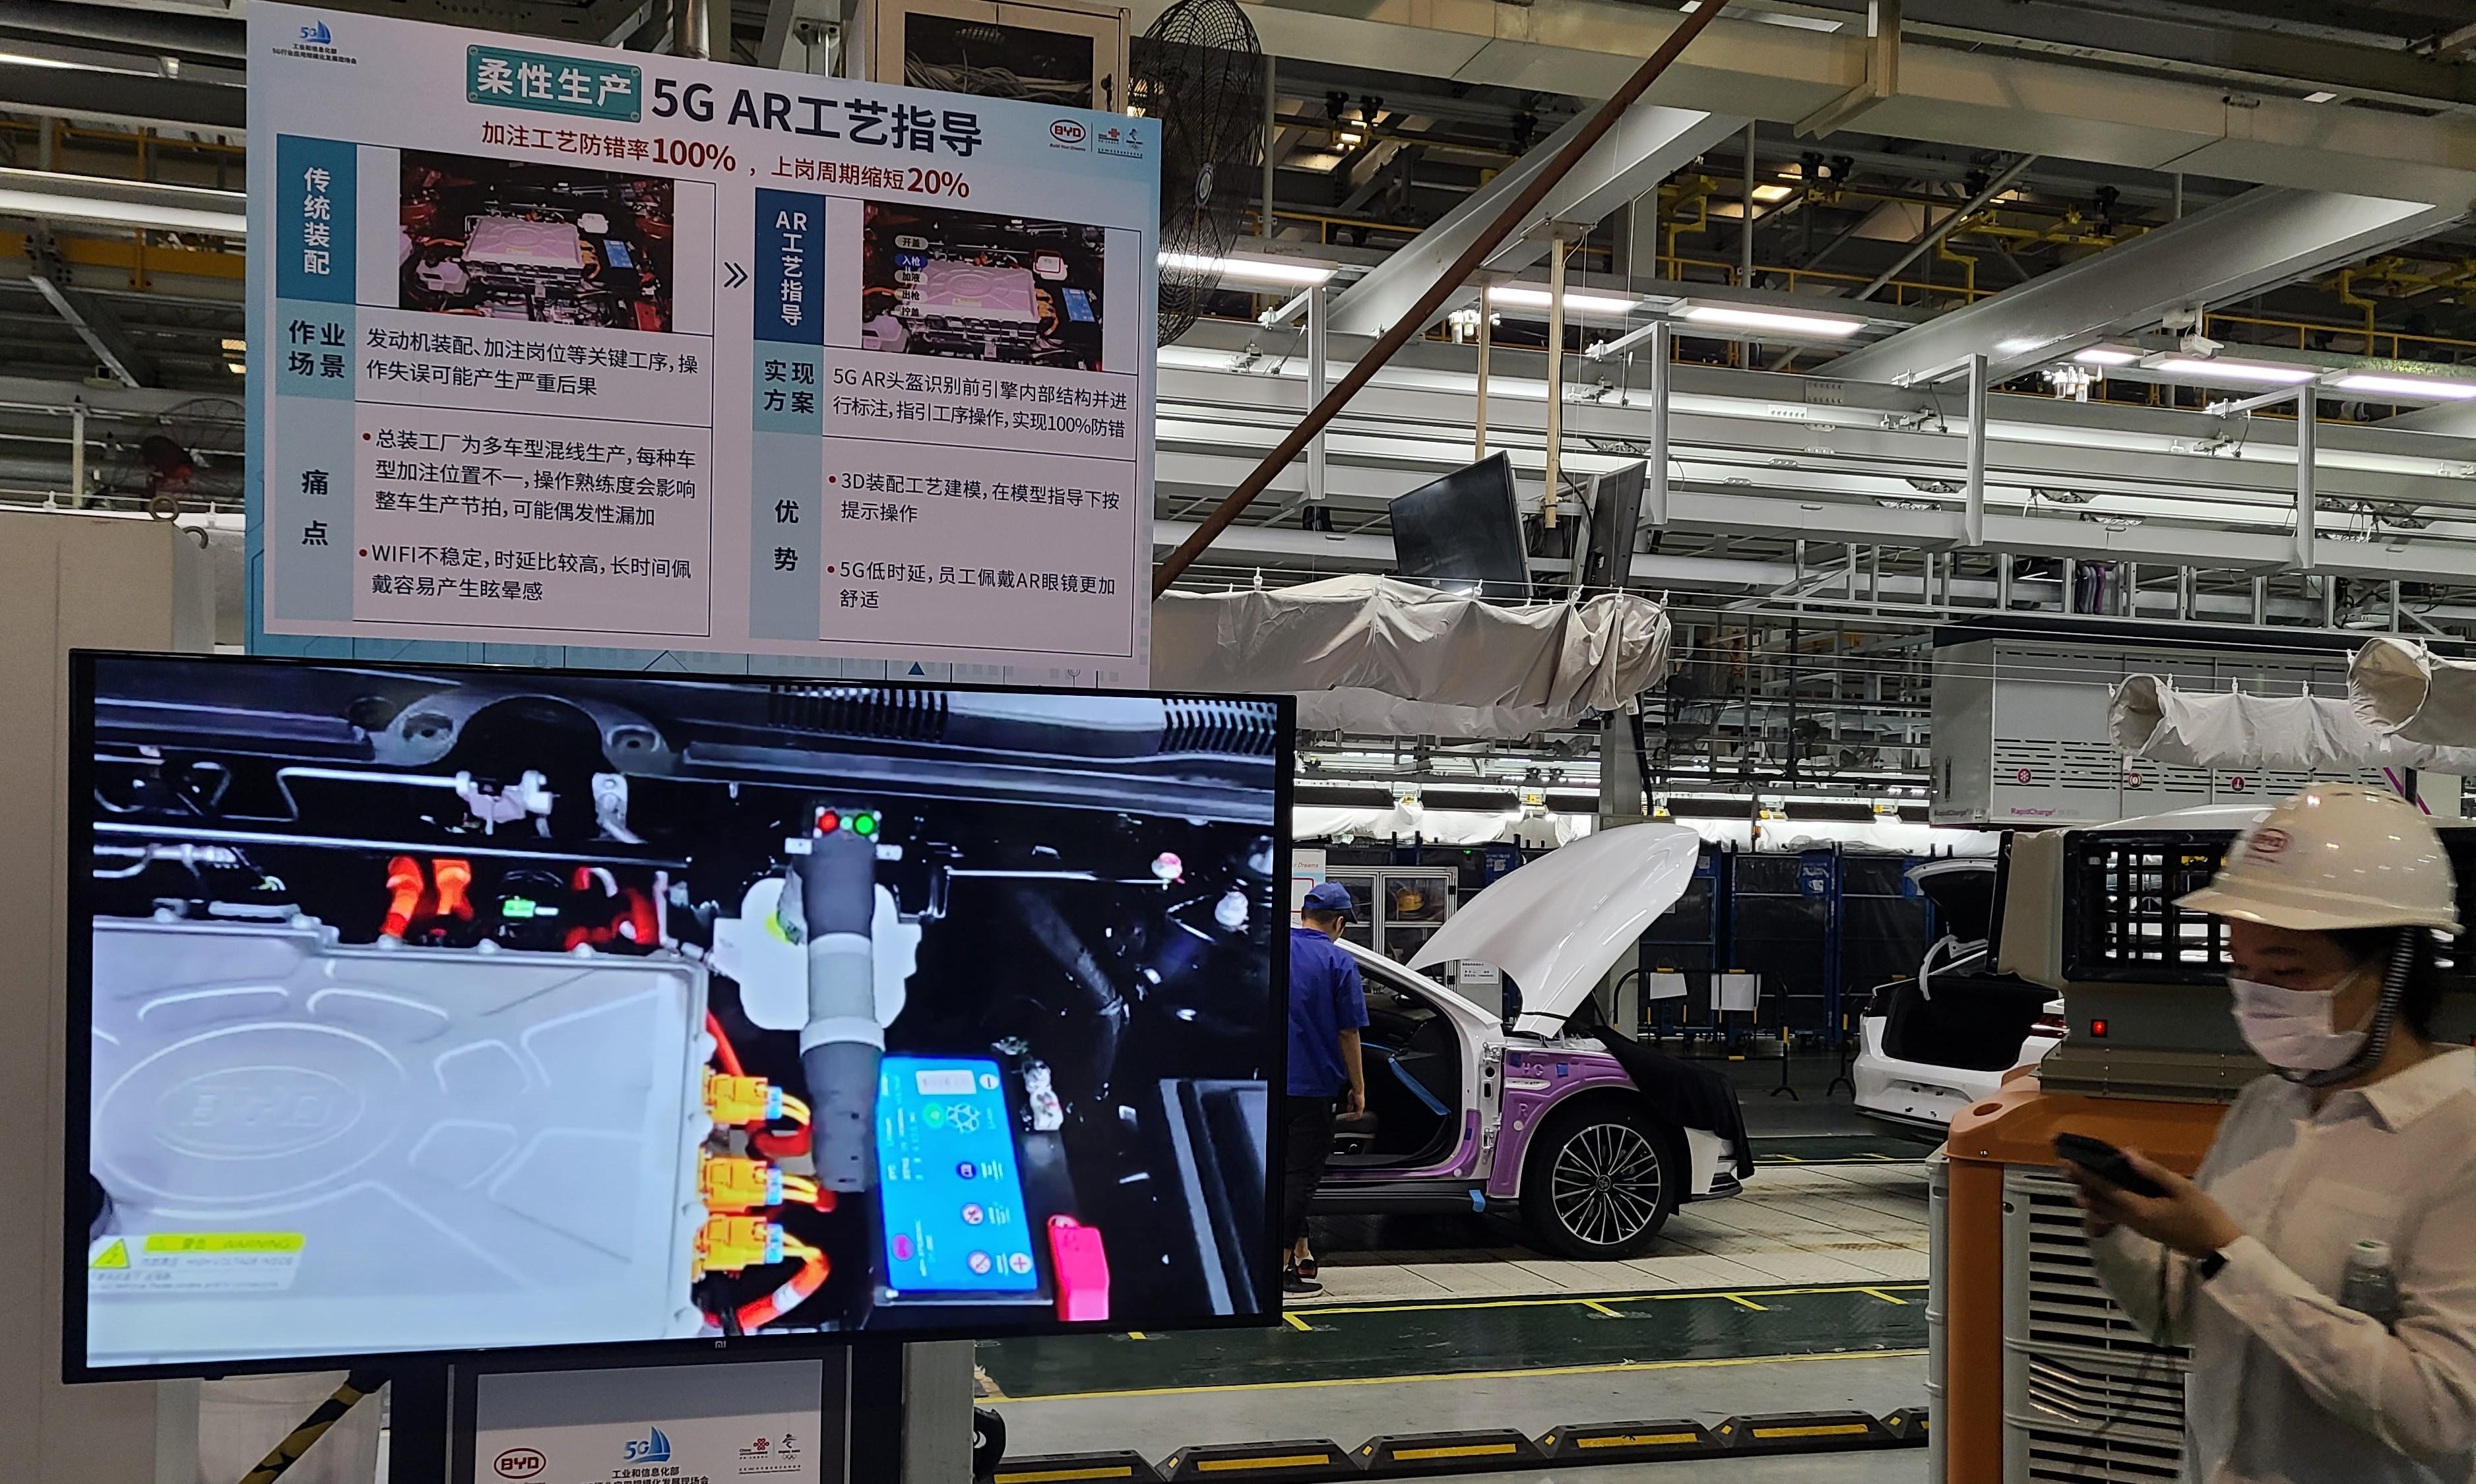 Rokid AR携手中国联通,为比亚迪打造智能工厂-芯智讯